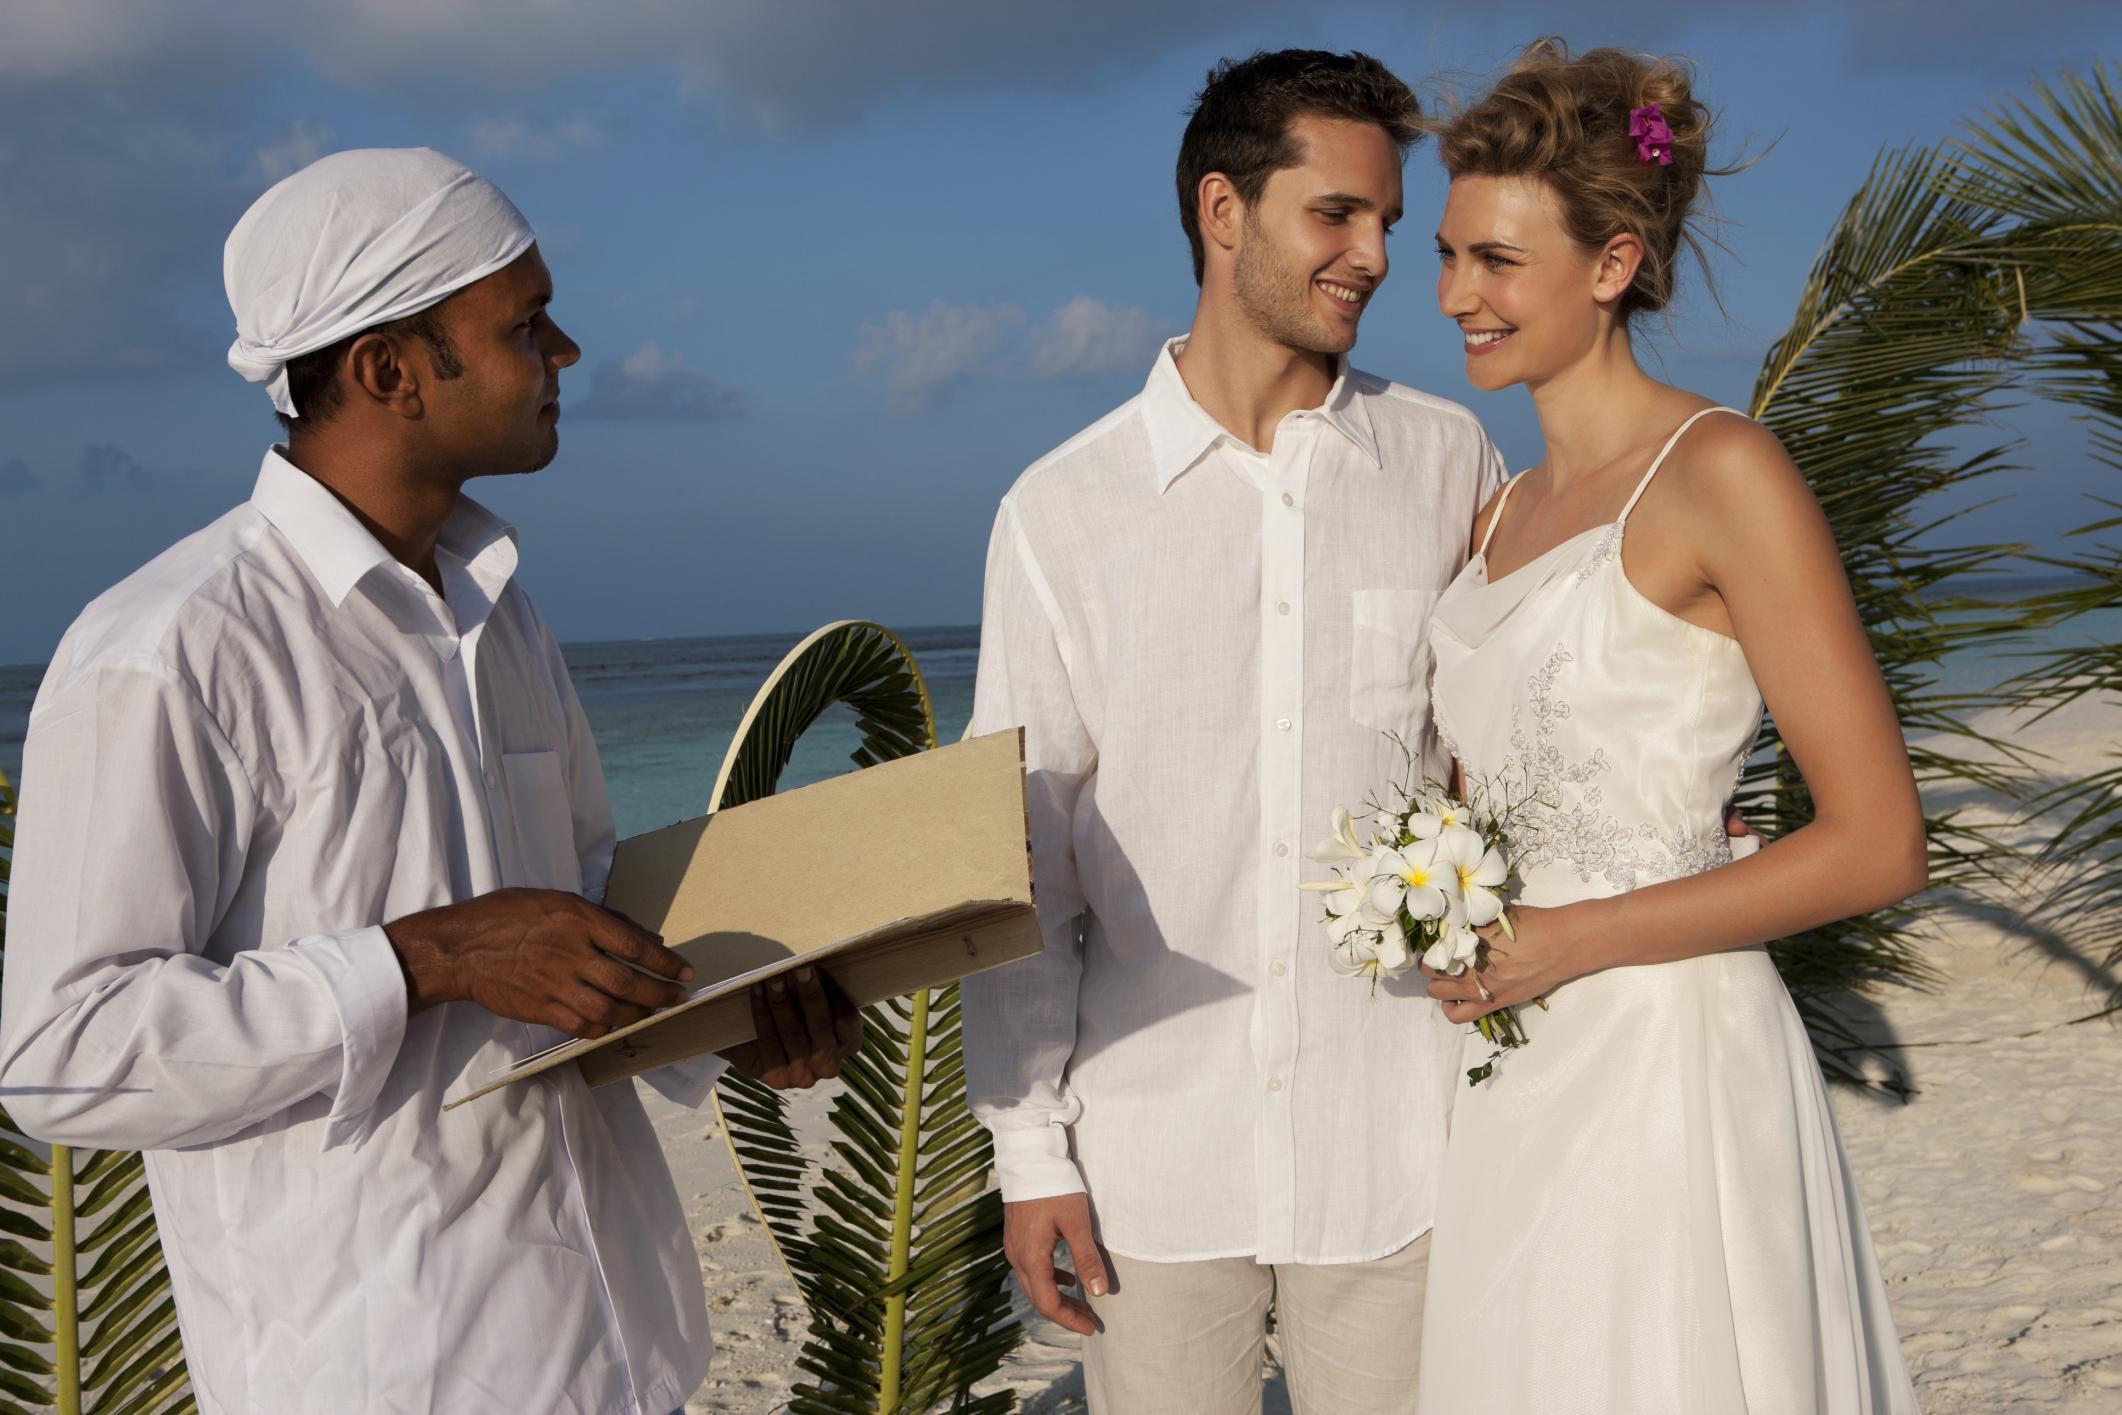 Sample Secular (Non-Religious) Wedding Ceremony Script